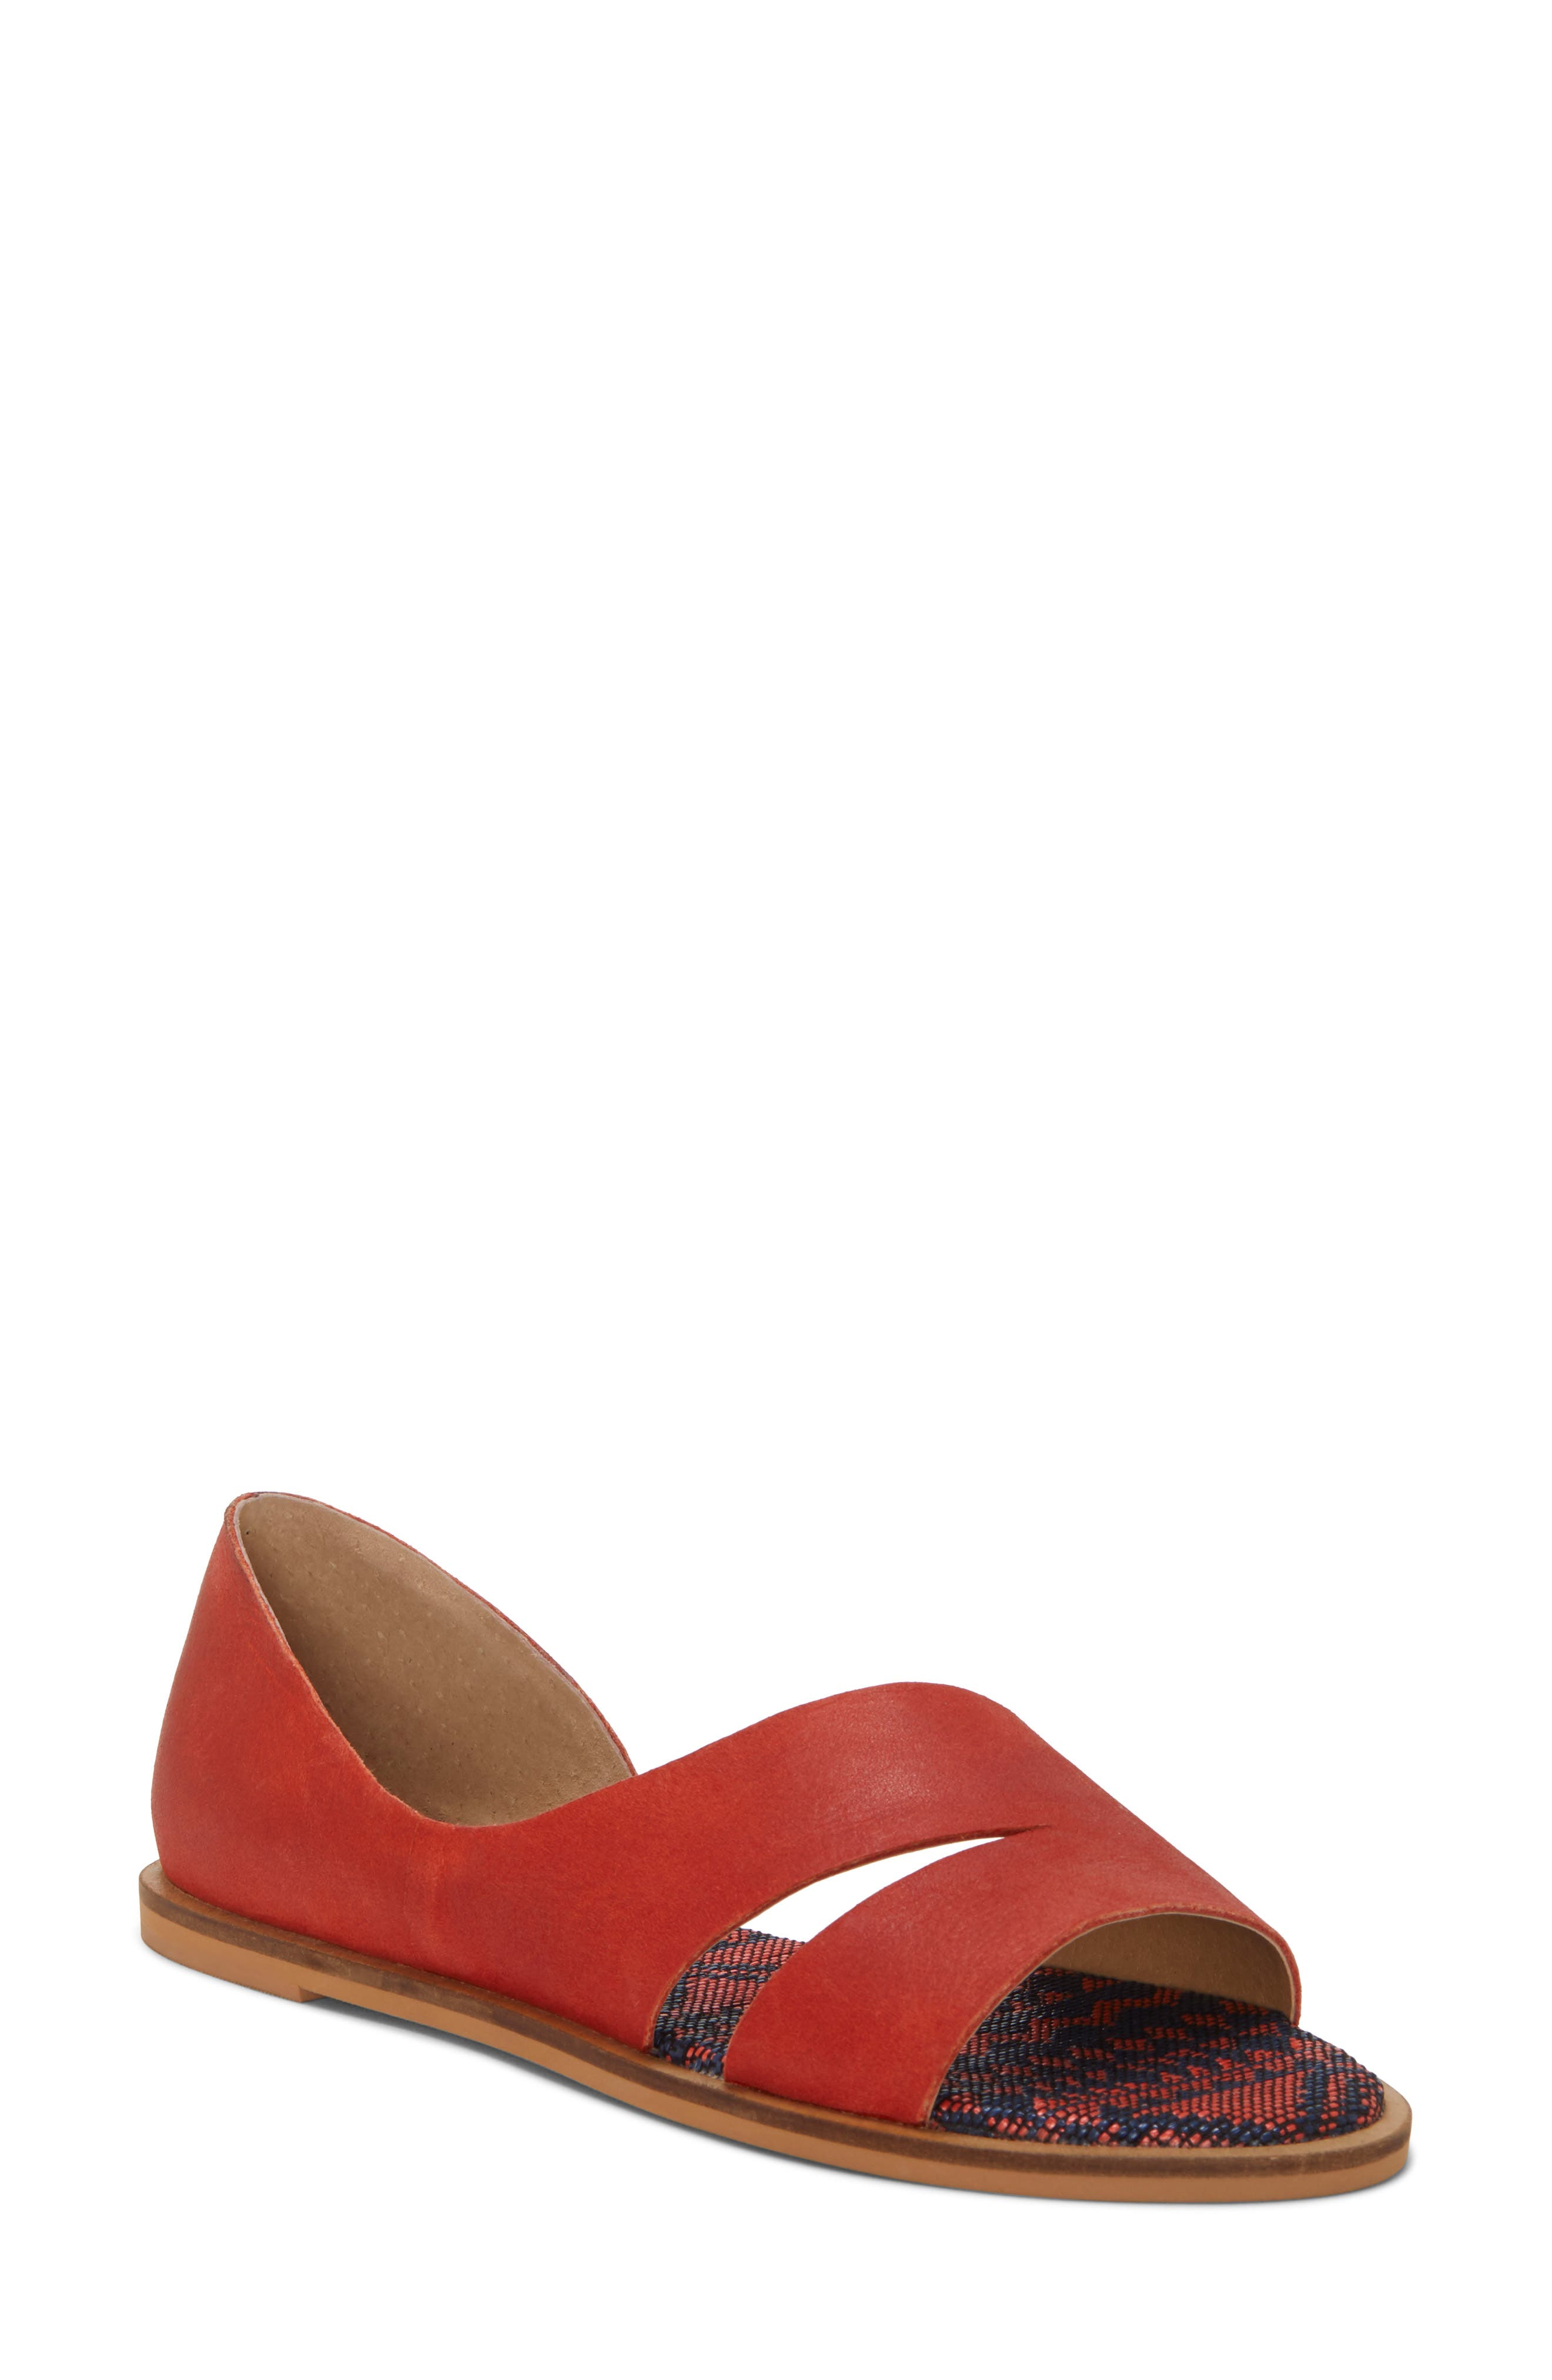 Lucky Brand Felicitas Flat Sandal- Brown